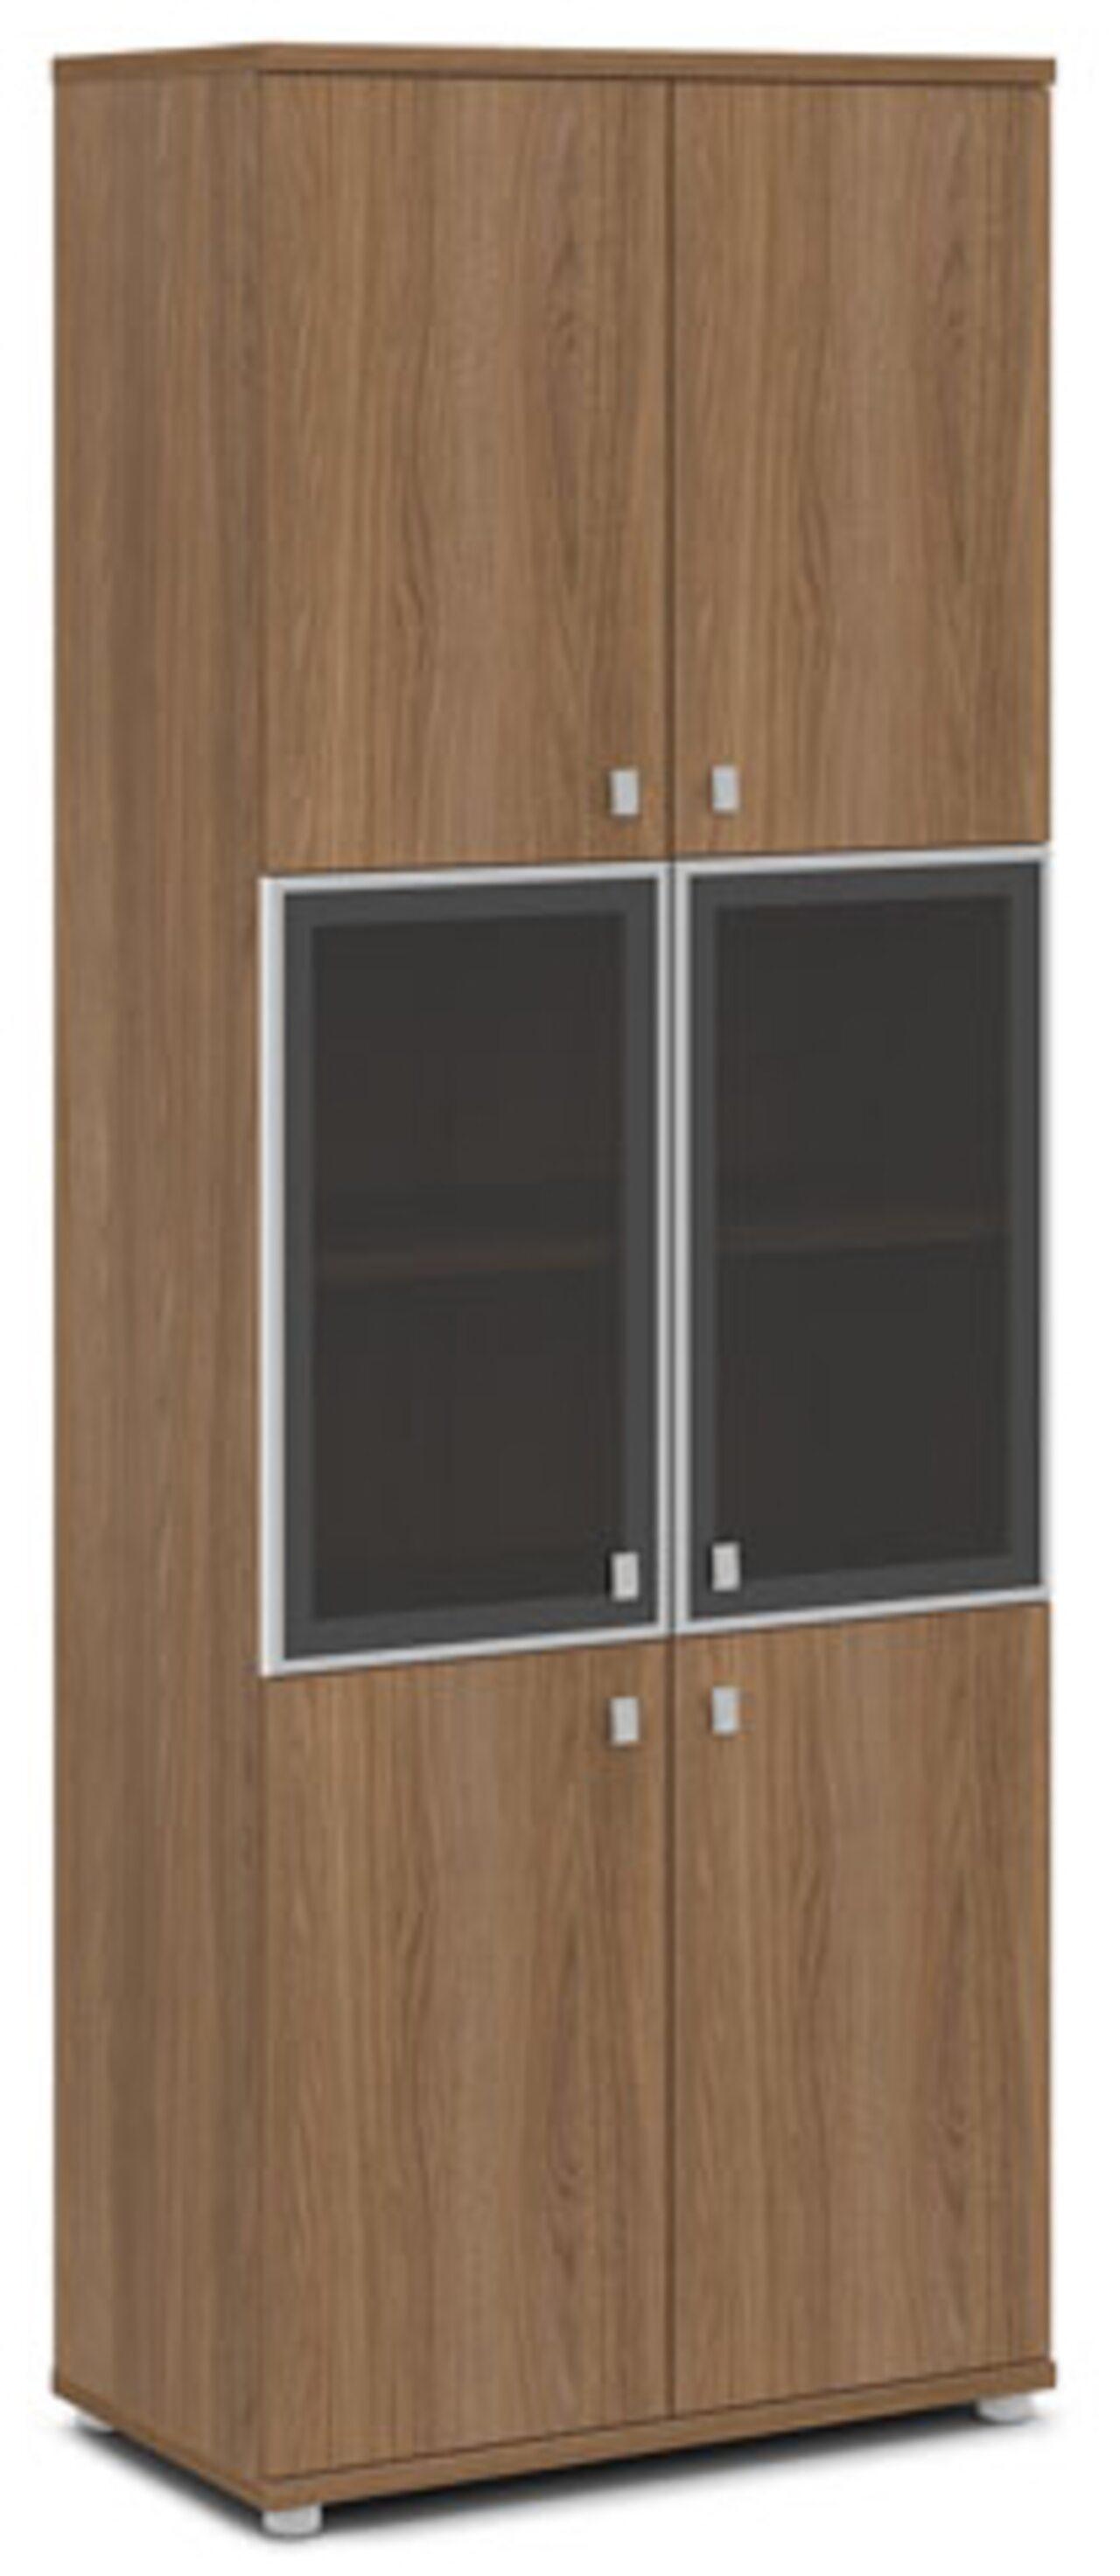 Шкаф со стеклом в алюминиевом профиле  Vasanta 82x44x220 - фото 5